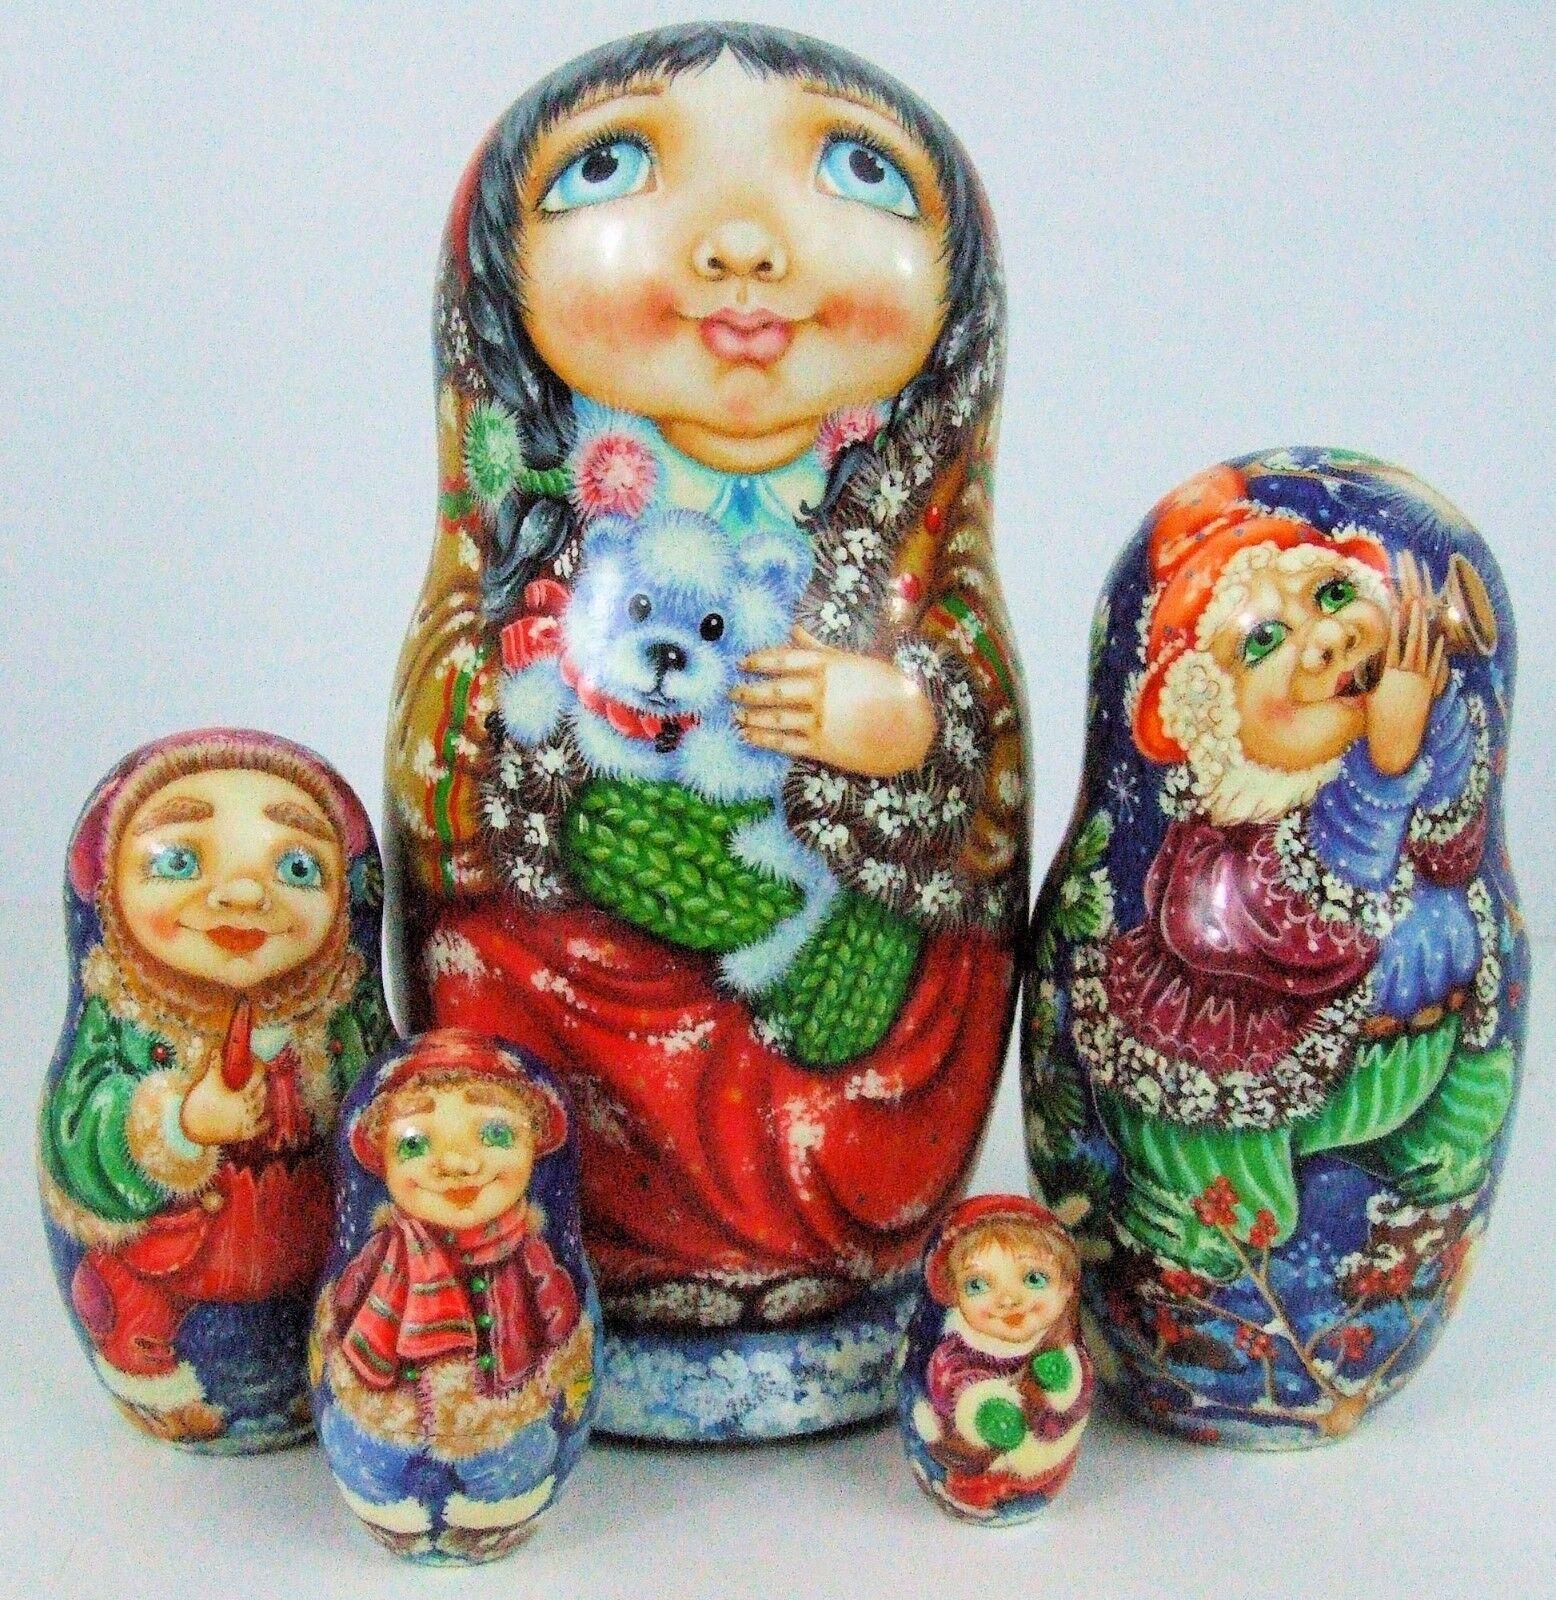 5pcs Pintado a Mano Muñecos-caja Rusos  Christmas Time  por Artista Pokrovskaya